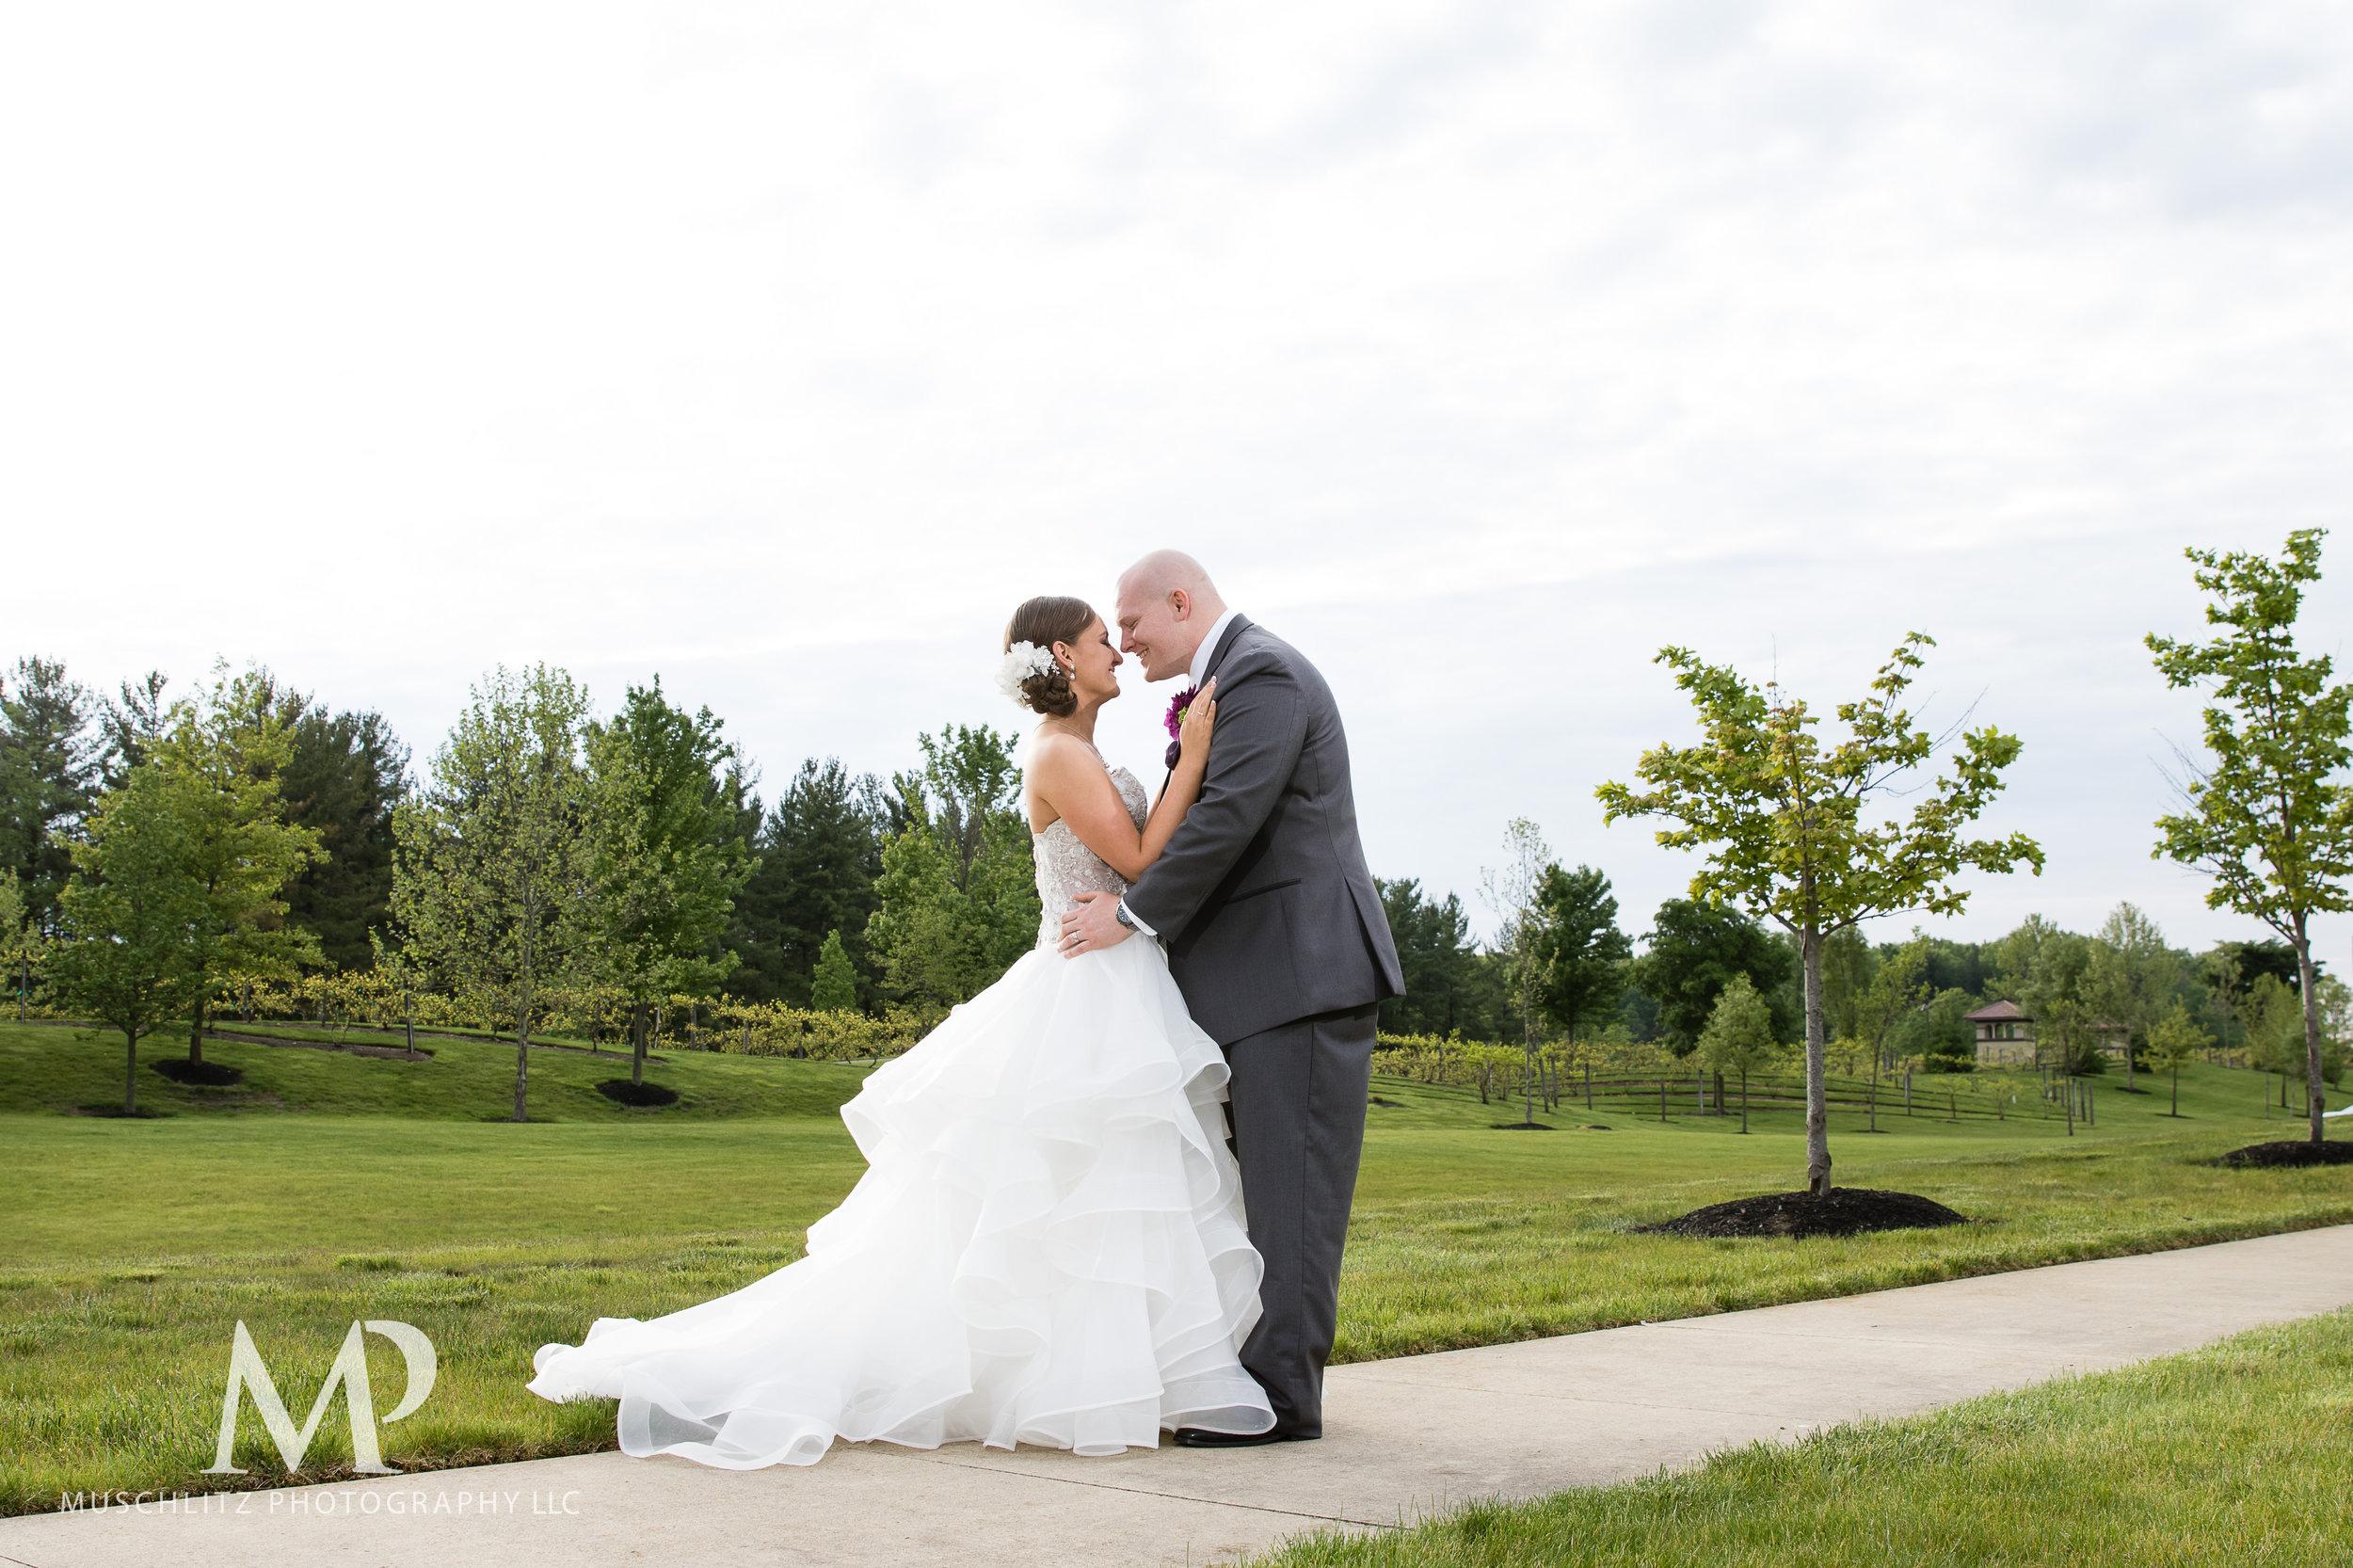 club-at-corazon-wedding-ceremony-reception-columbus-dublin-ohio-ohio-university-theme-058.JPG